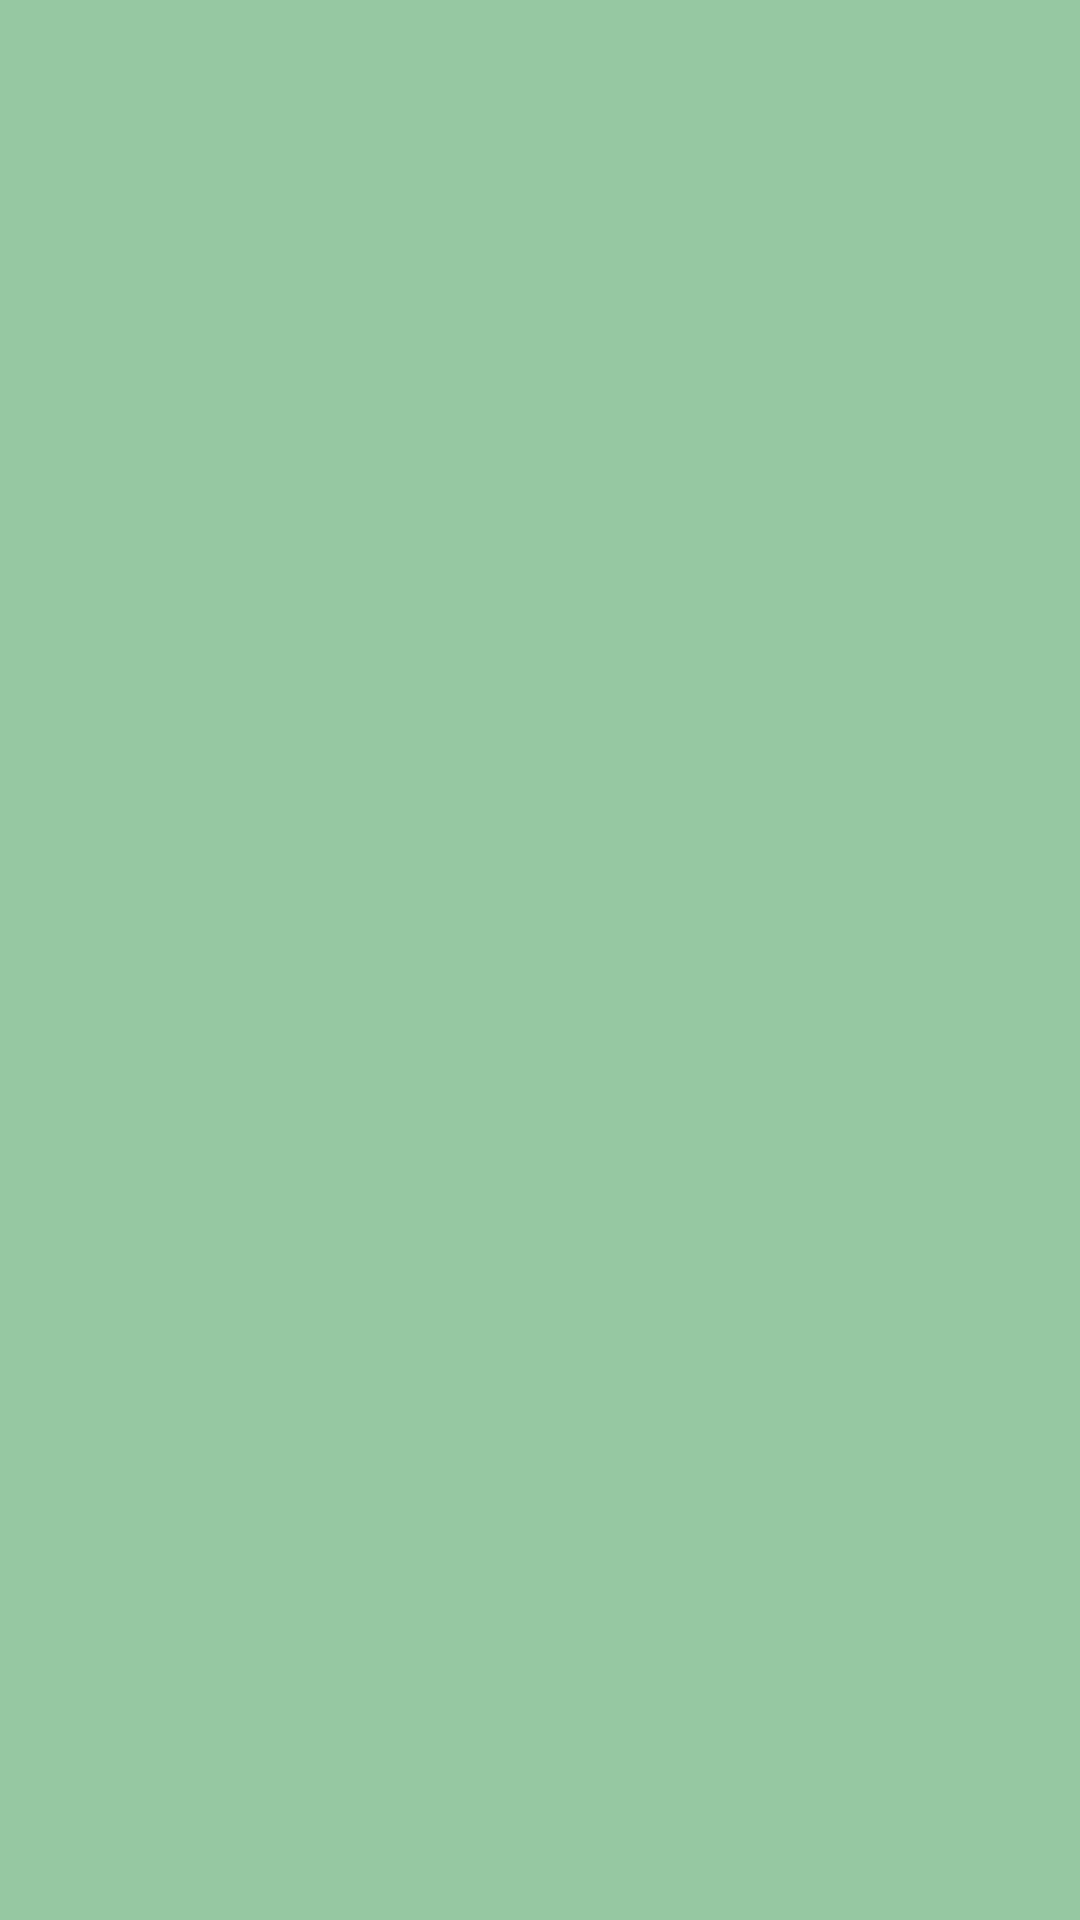 1080x1920 Eton Blue Solid Color Background